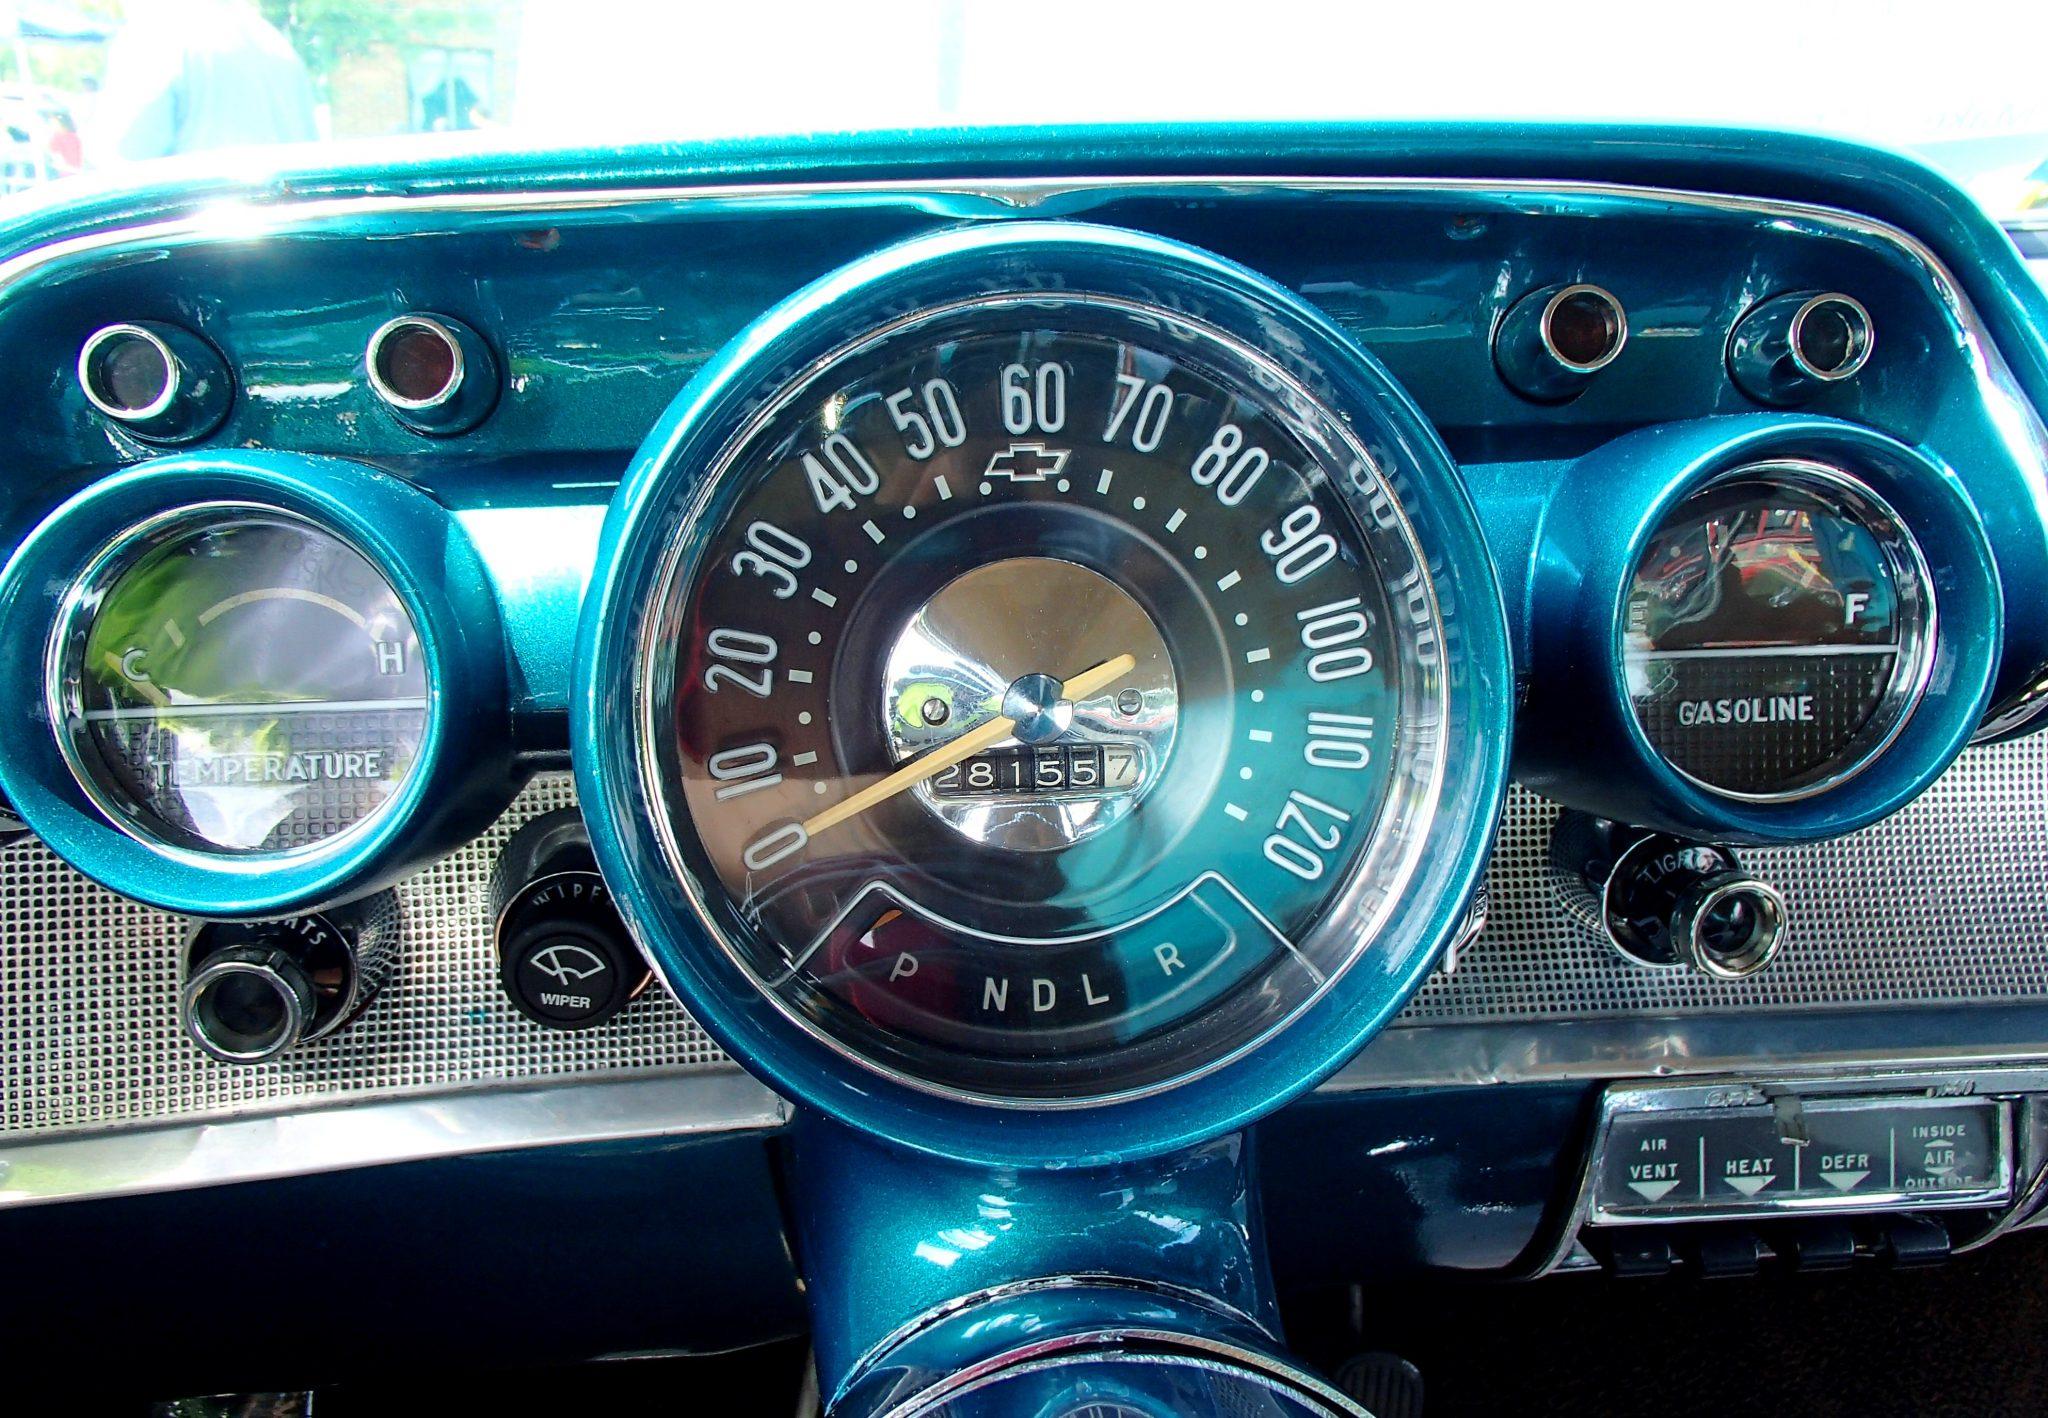 Bel Air Car >> Photo Finish: 1957 Chevy Bel Air - The News Wheel